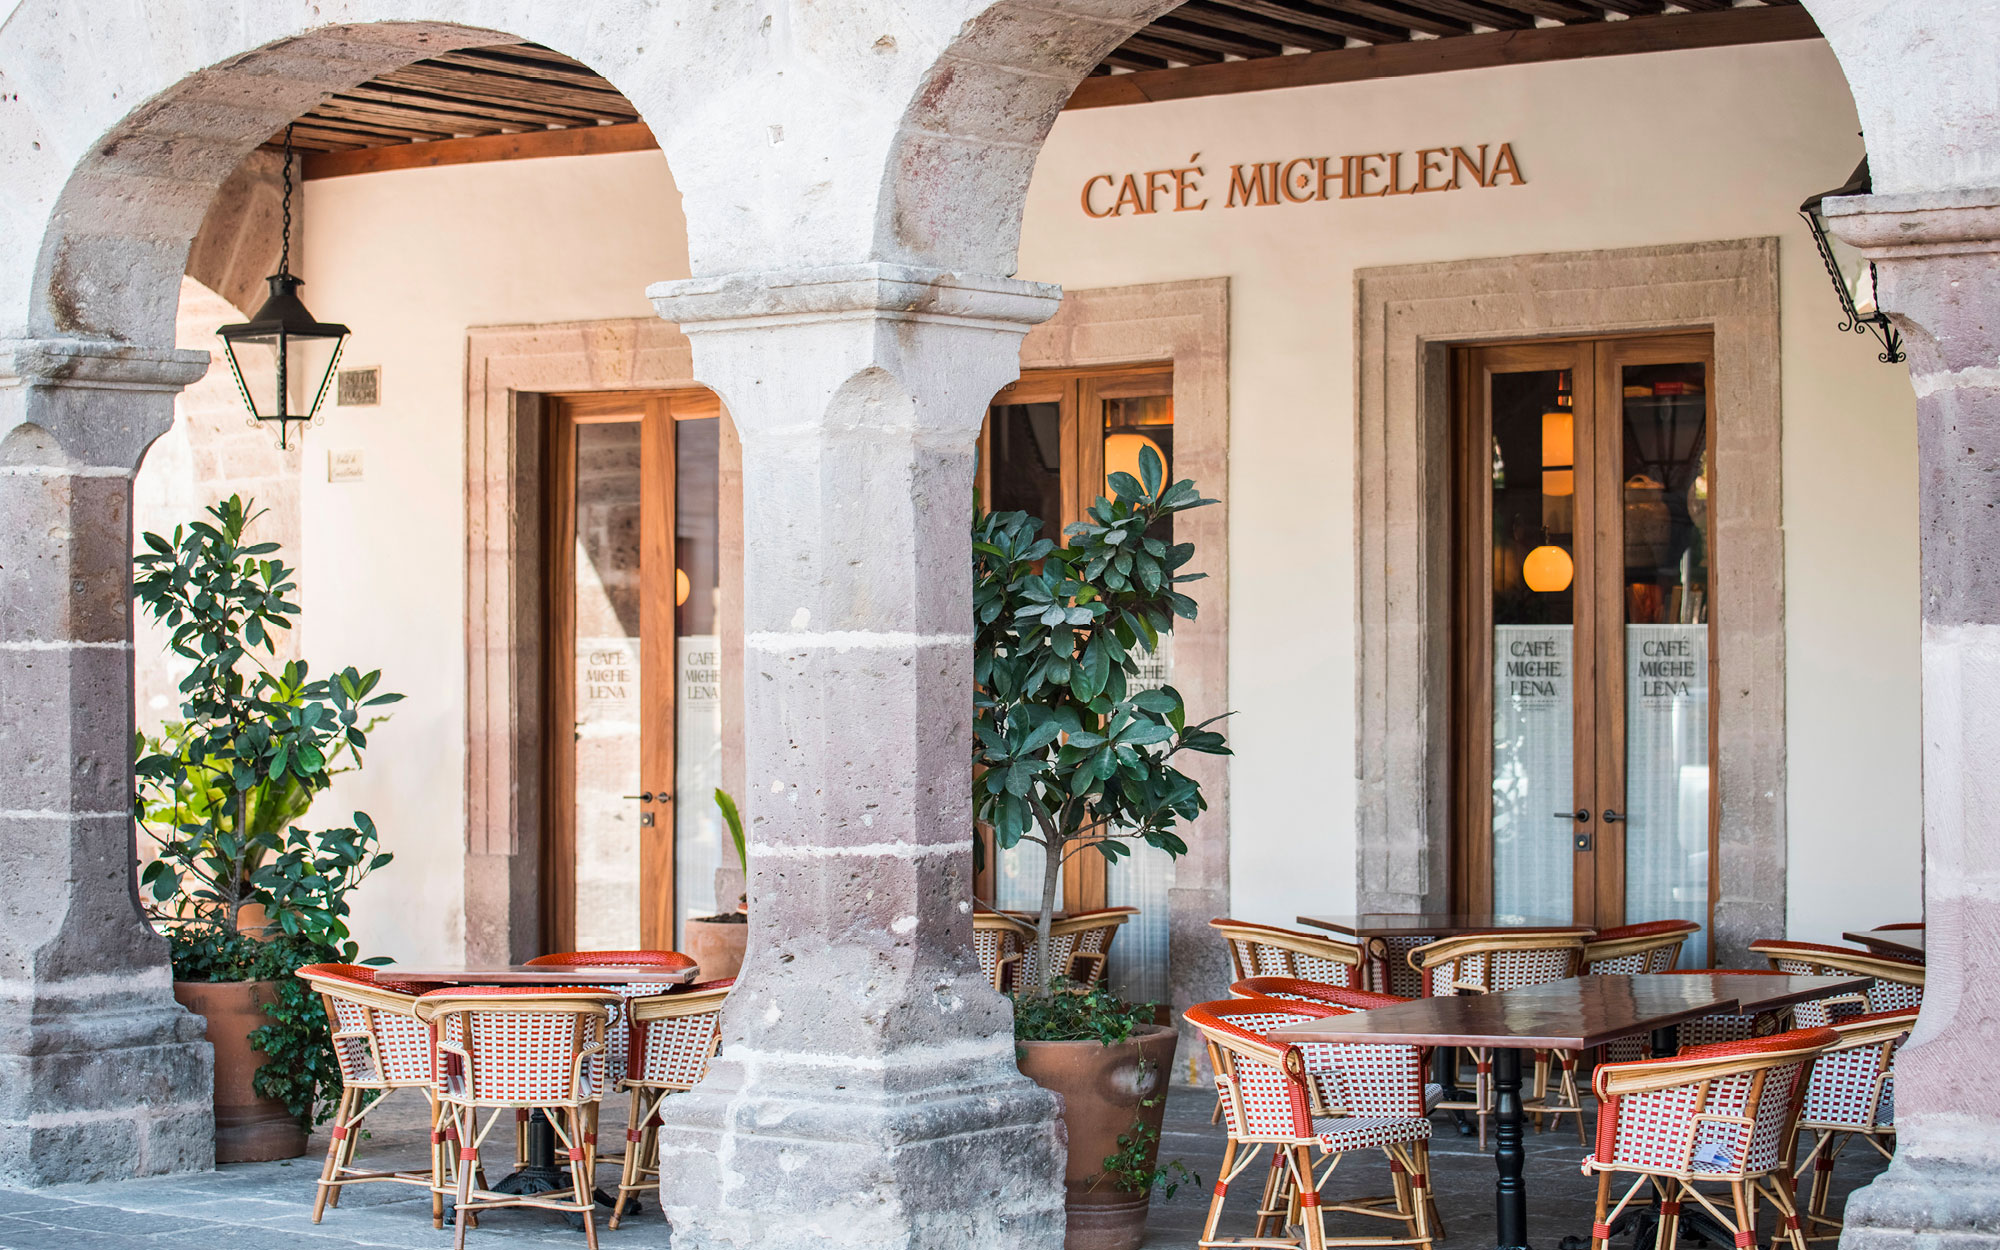 luis_laplace-Cafe_Michelena_Morelia-1